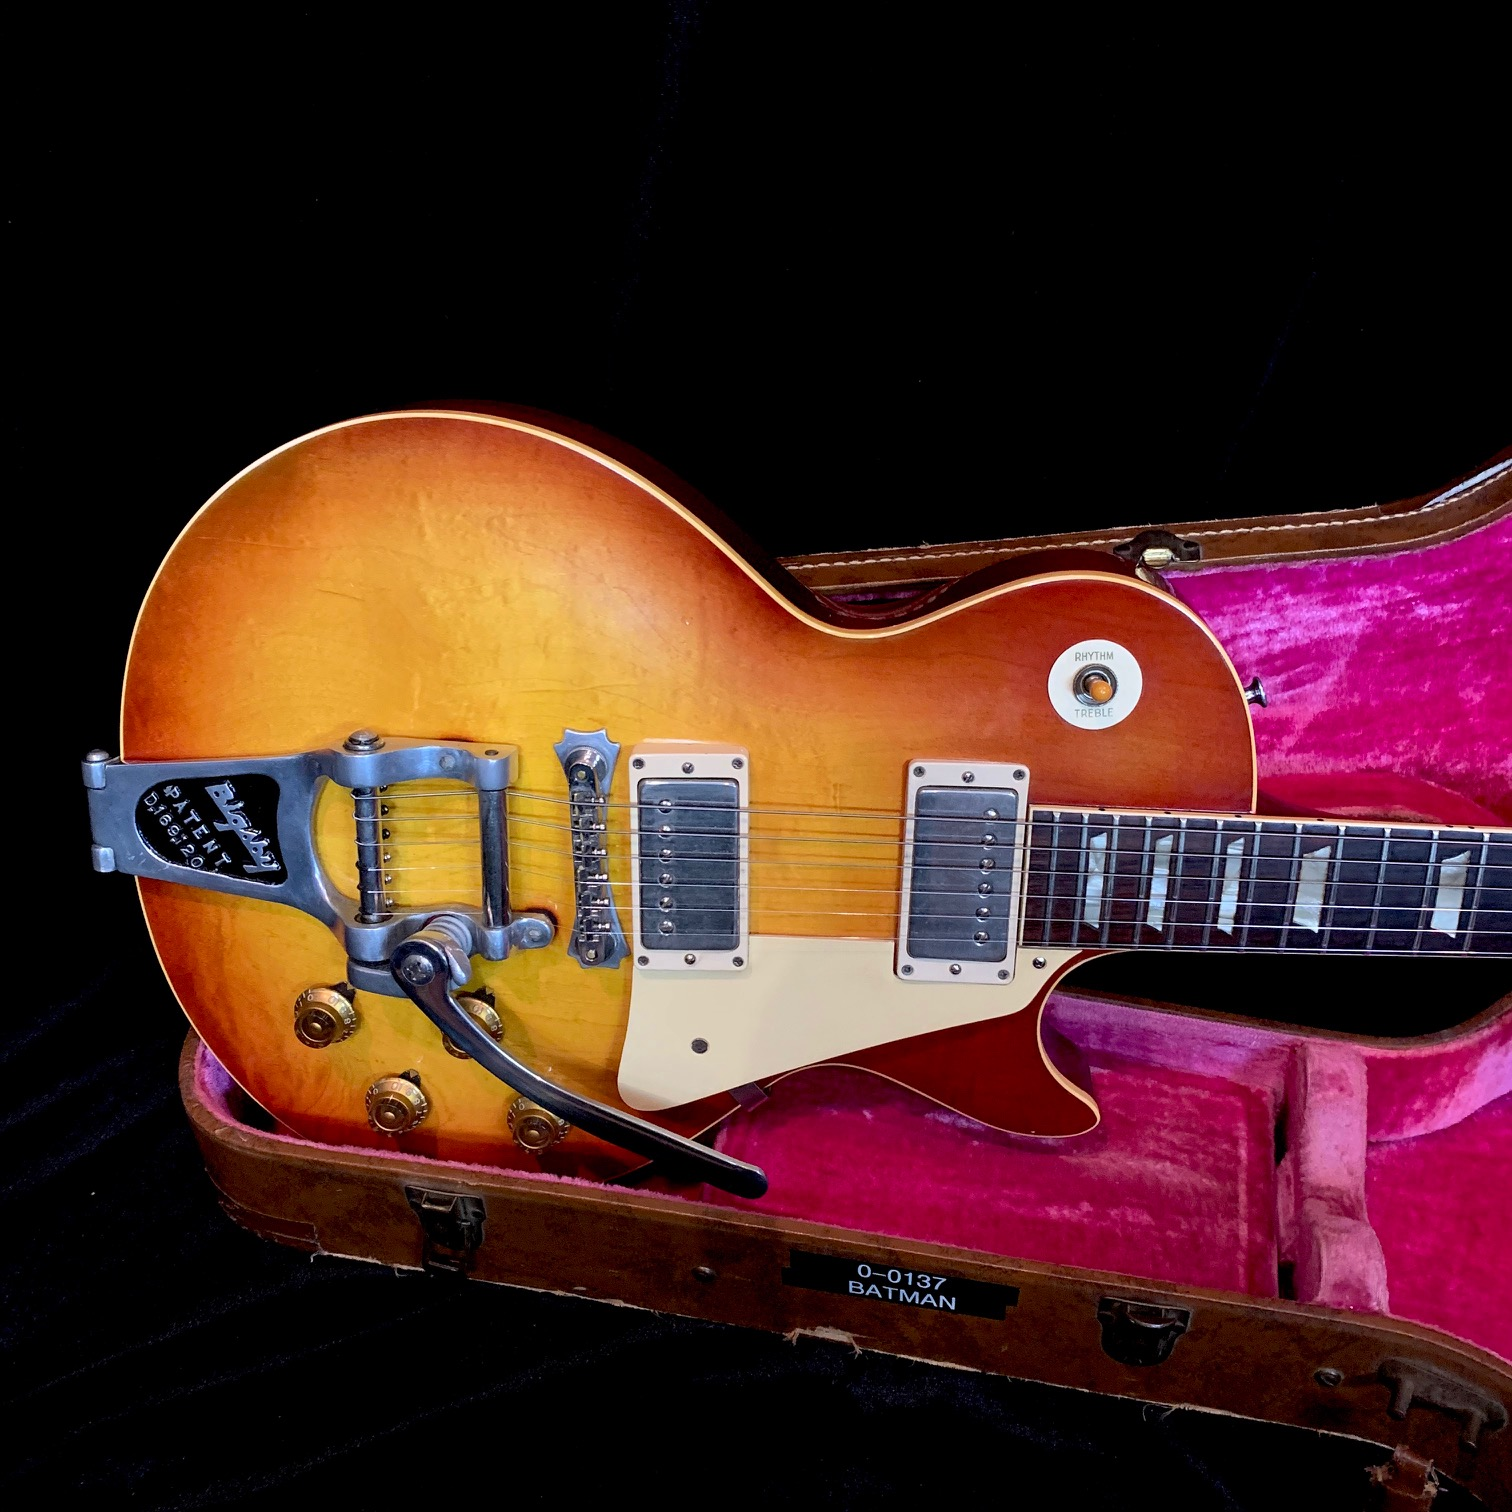 "1960 Gibson Les Paul Standard Sunburst SN# 0-0137 ""Batman Burst"""